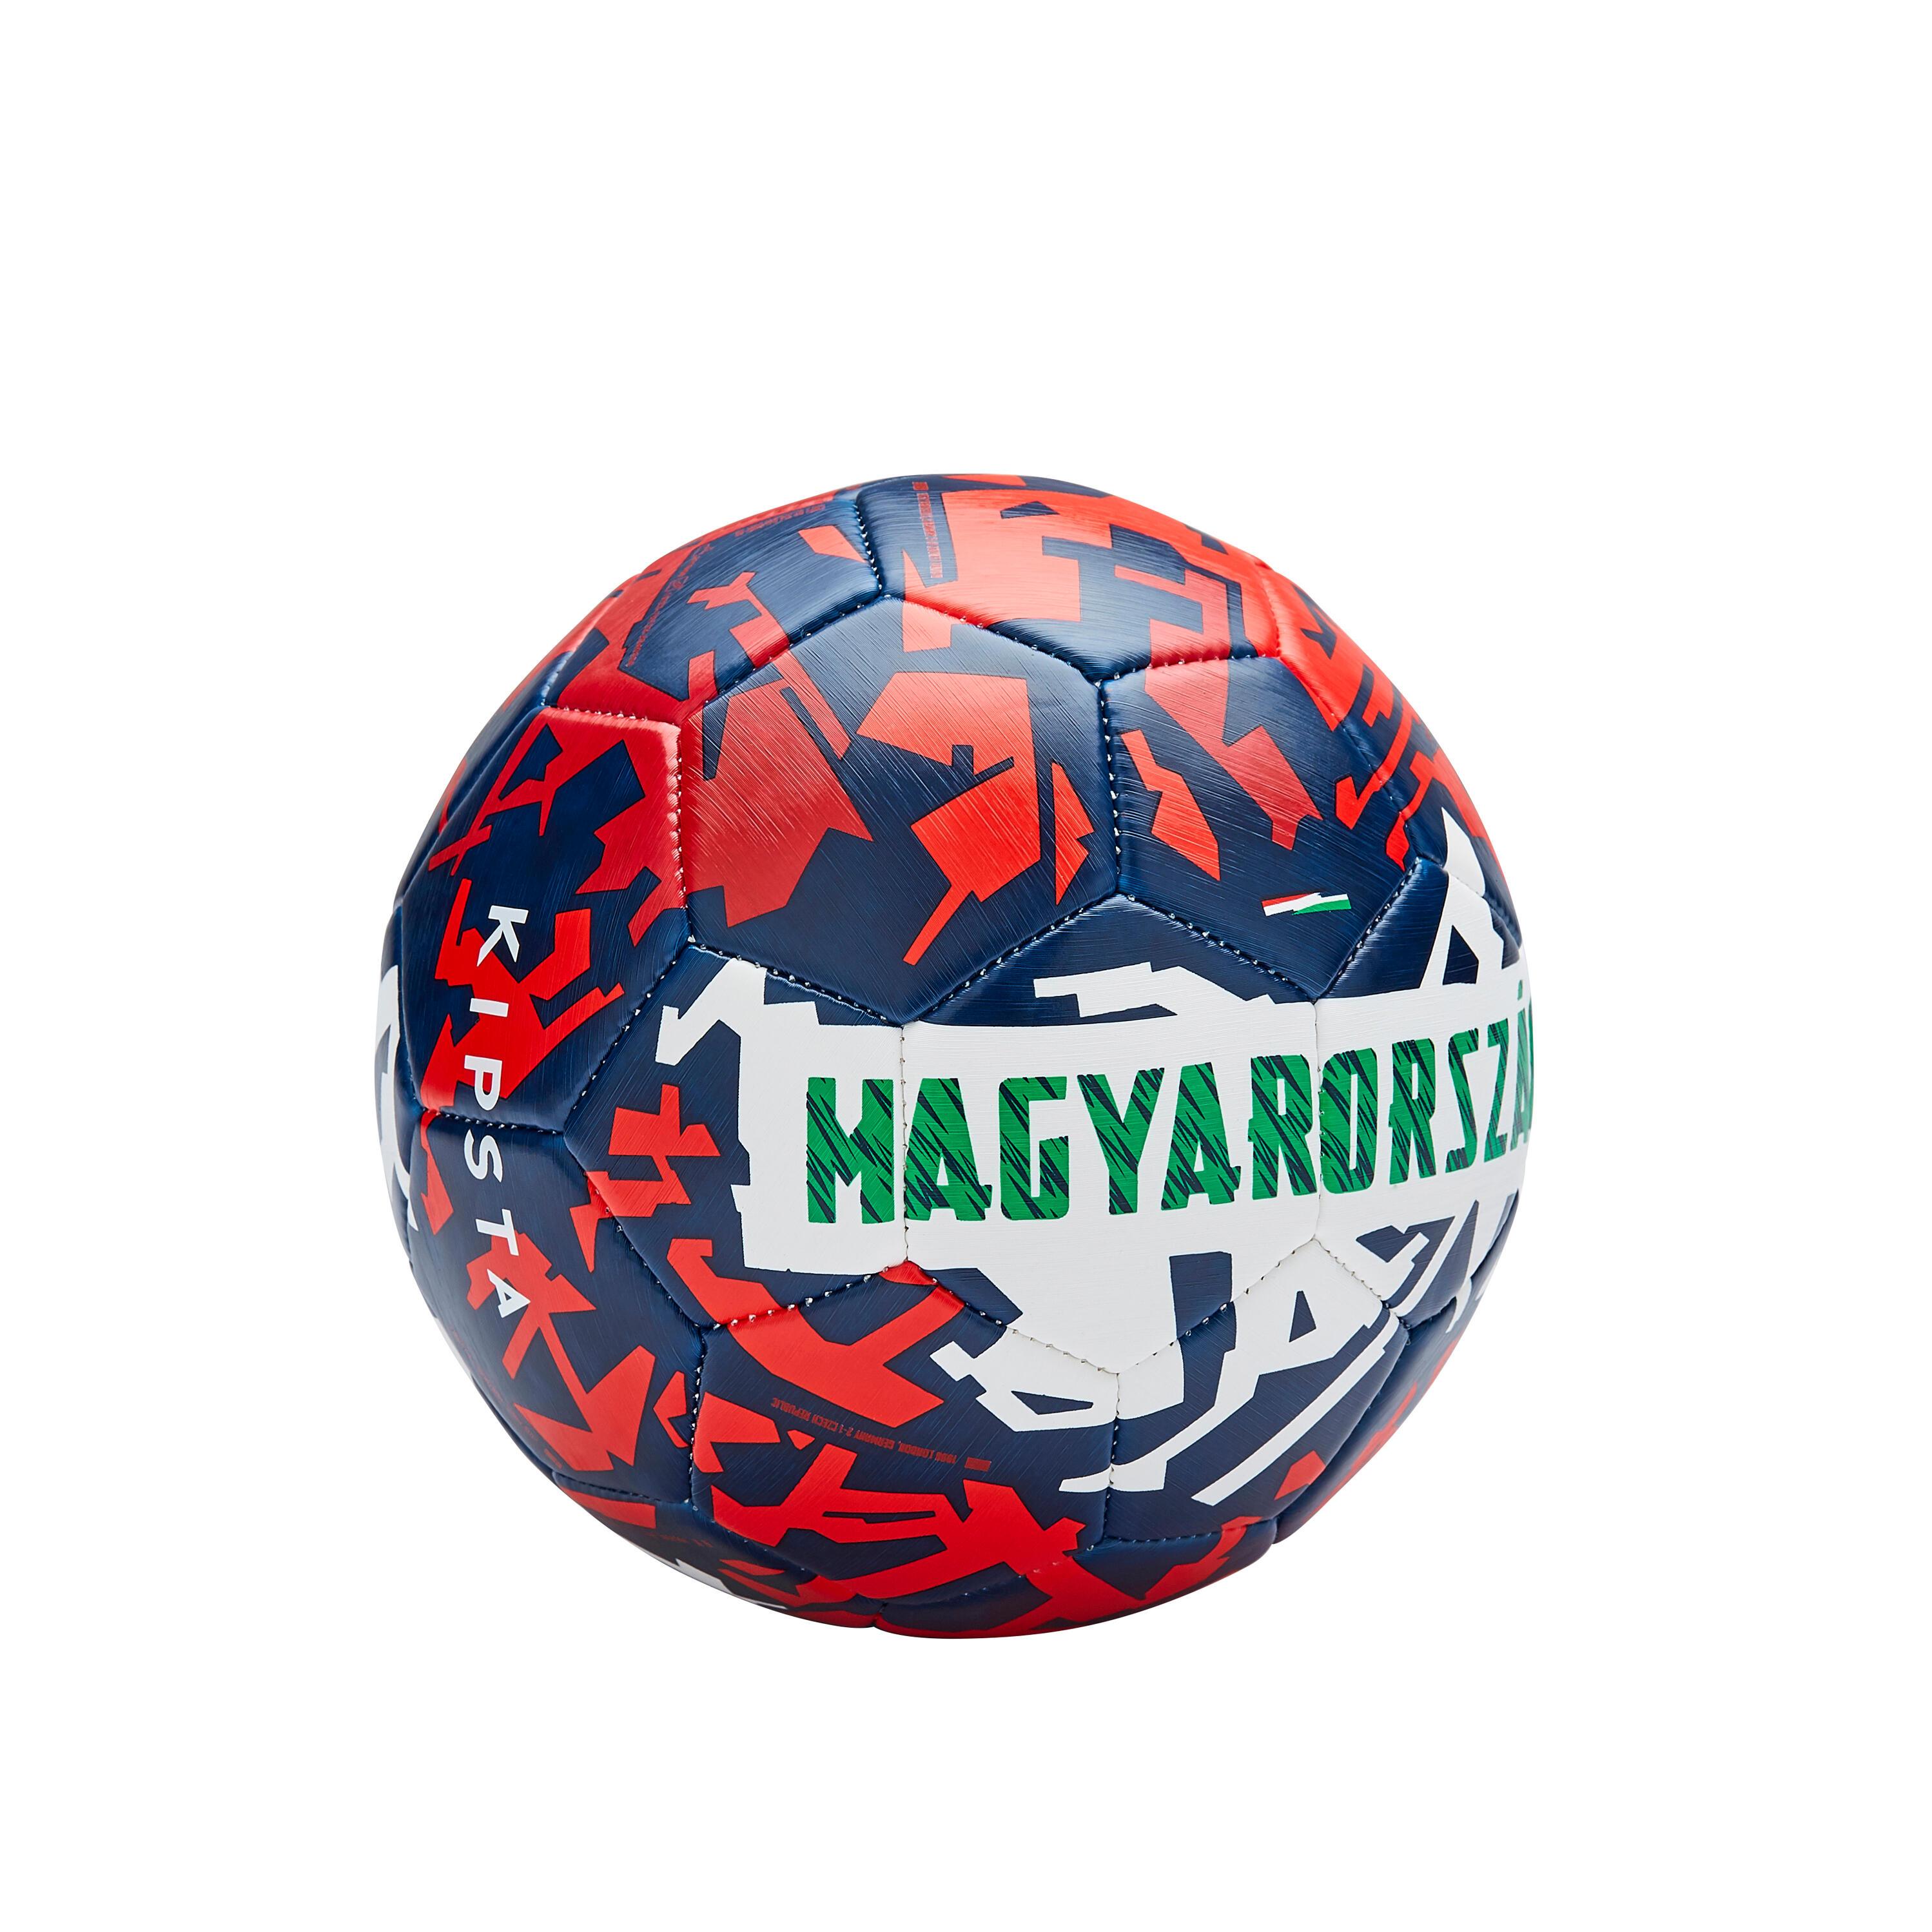 Minge Fotbal Ungaria 2020 M1 la Reducere poza